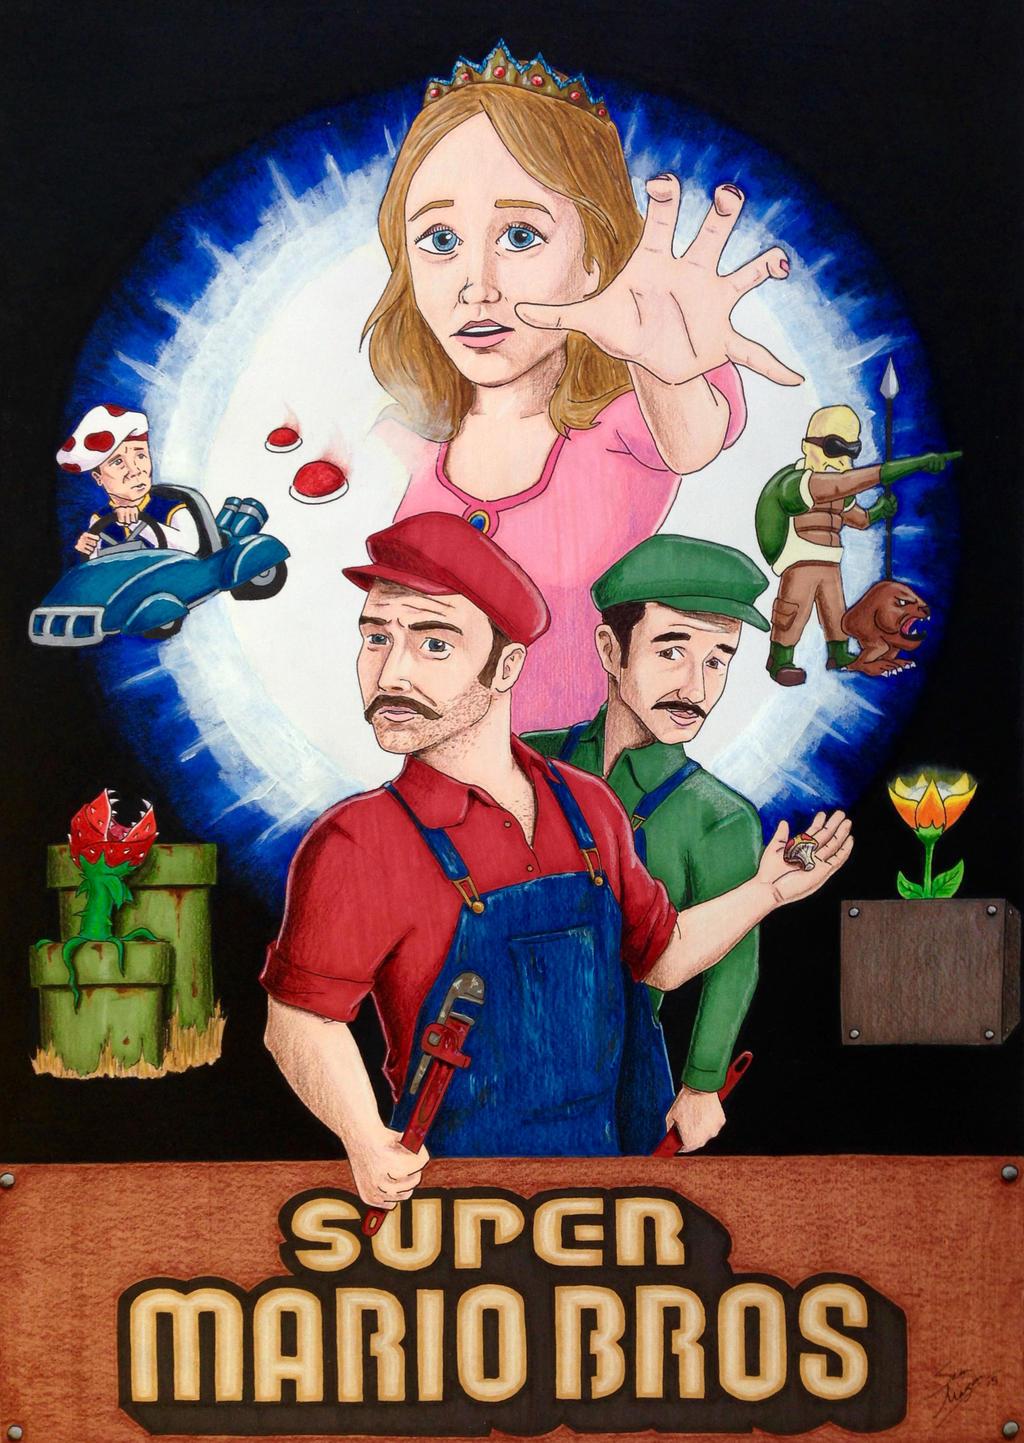 Super Mario Brothers by Mason44